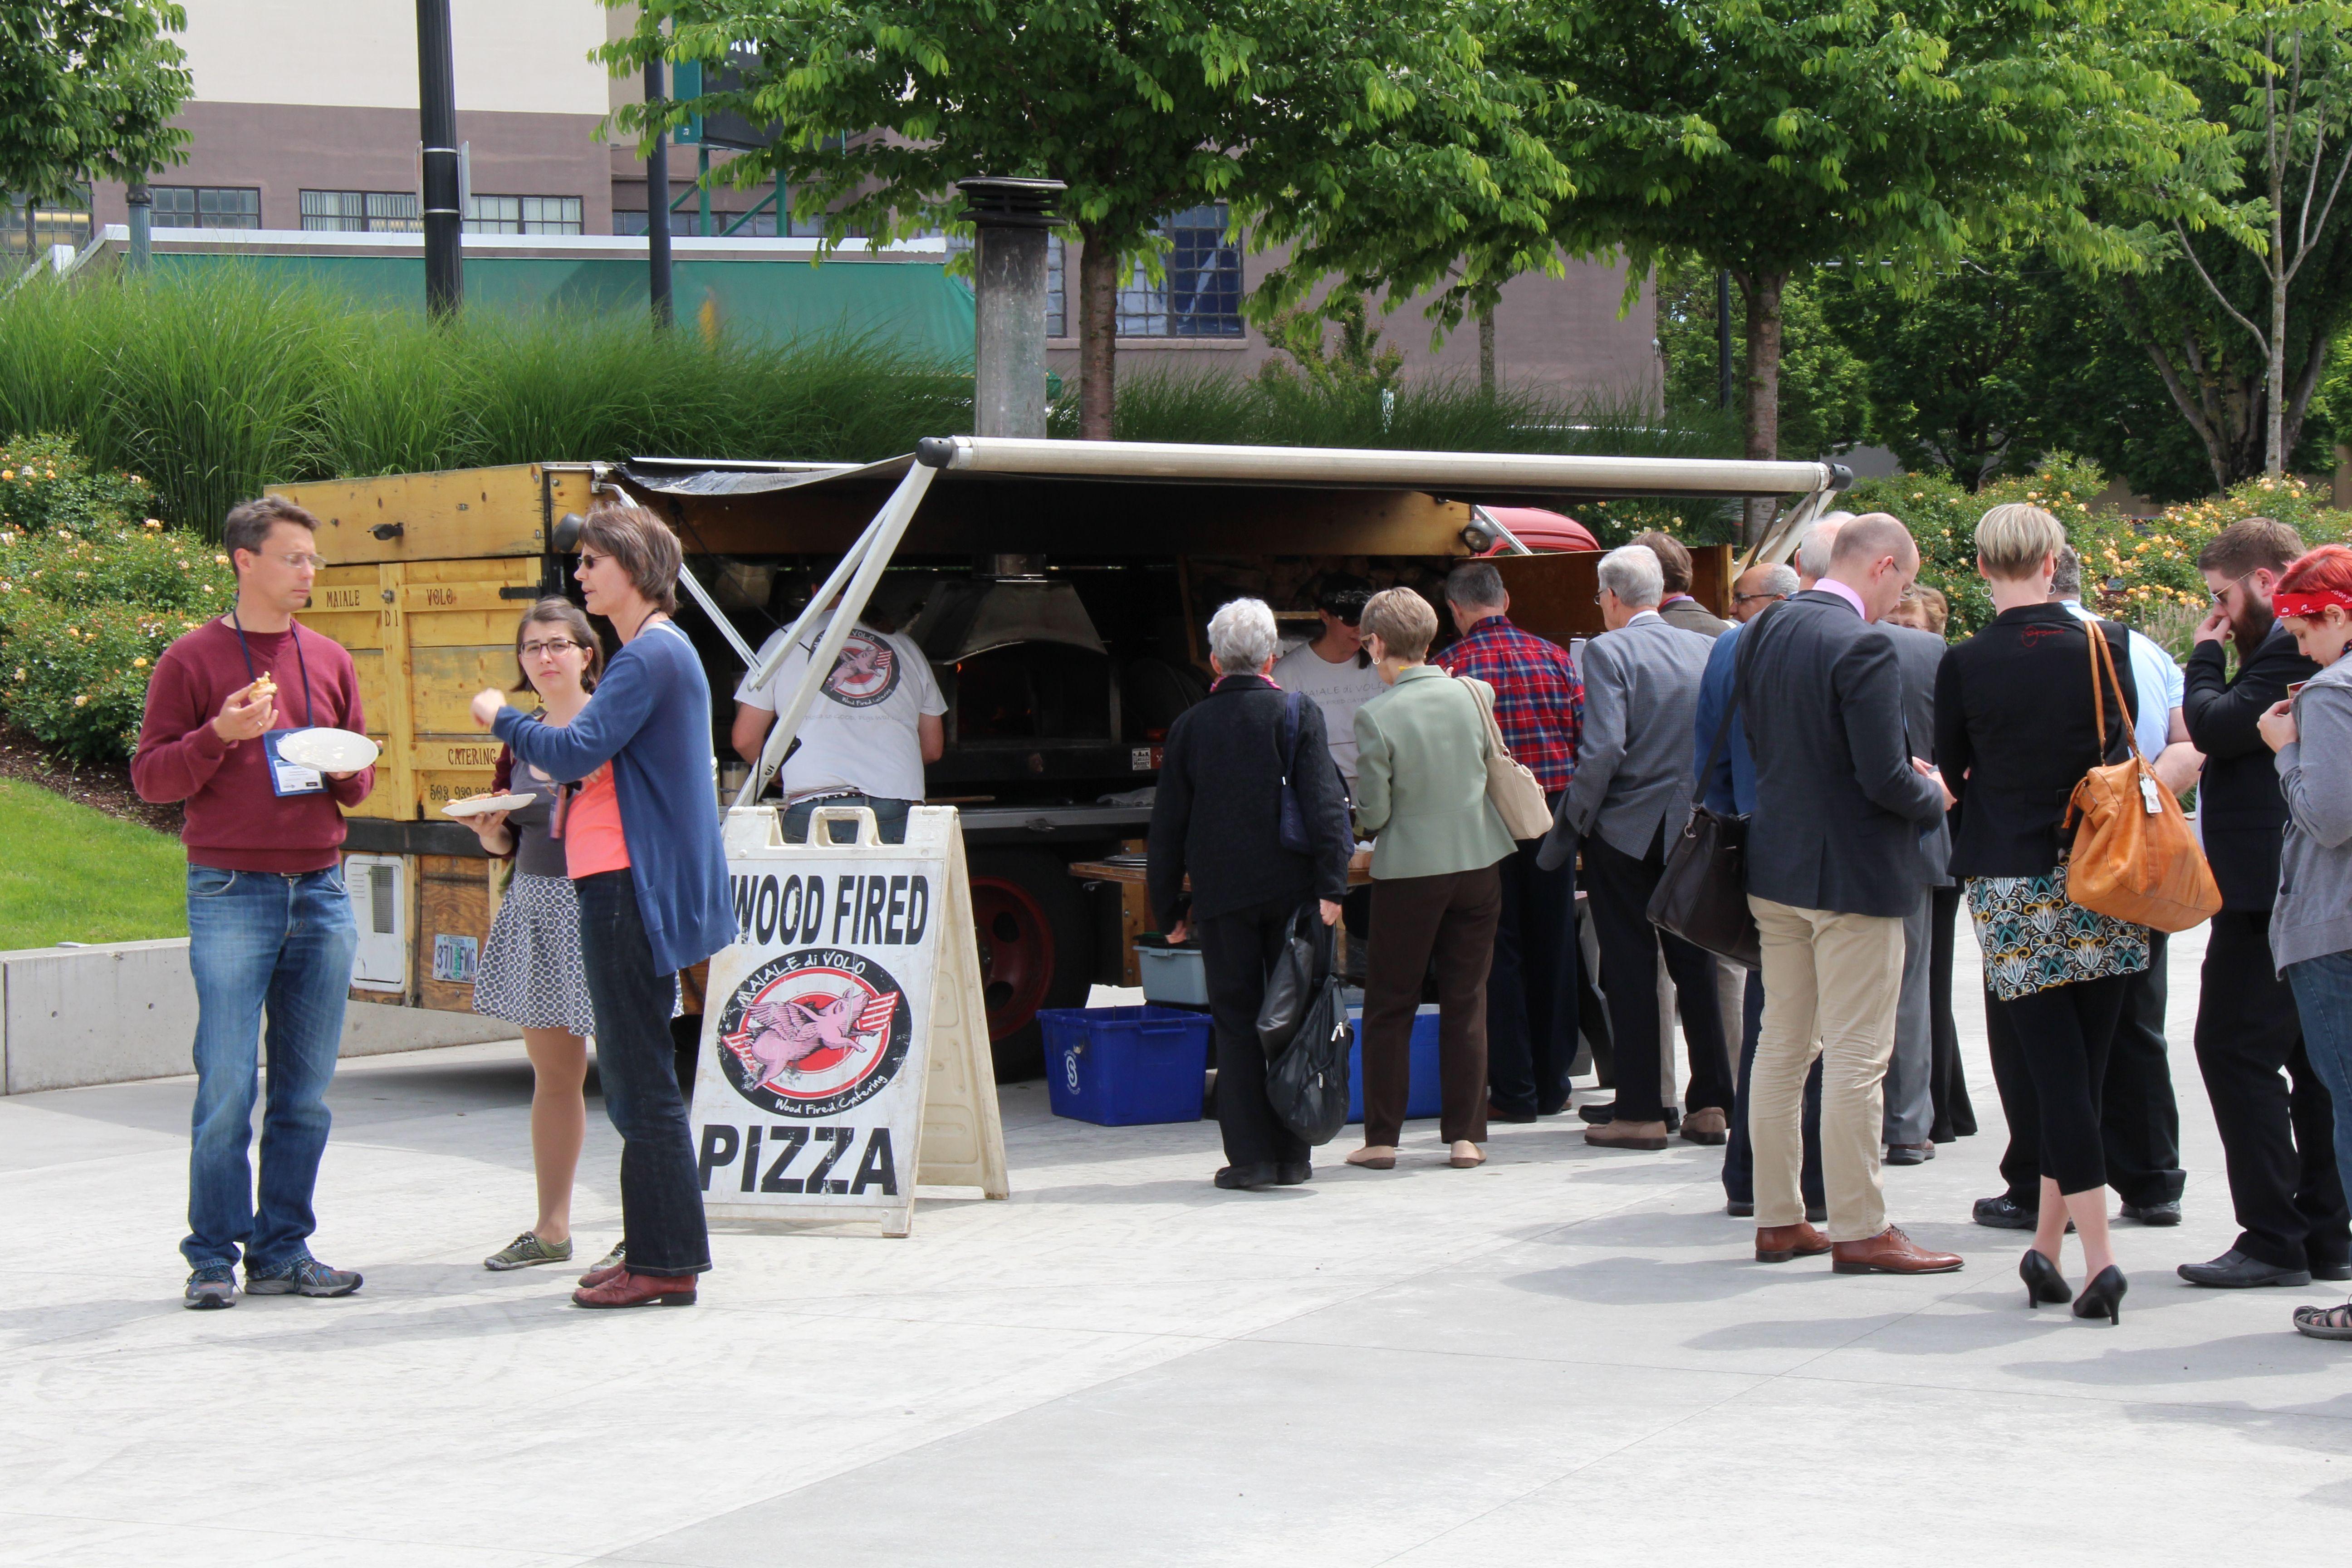 Food Truck - OCC Plaza Photo: Nancy Erz